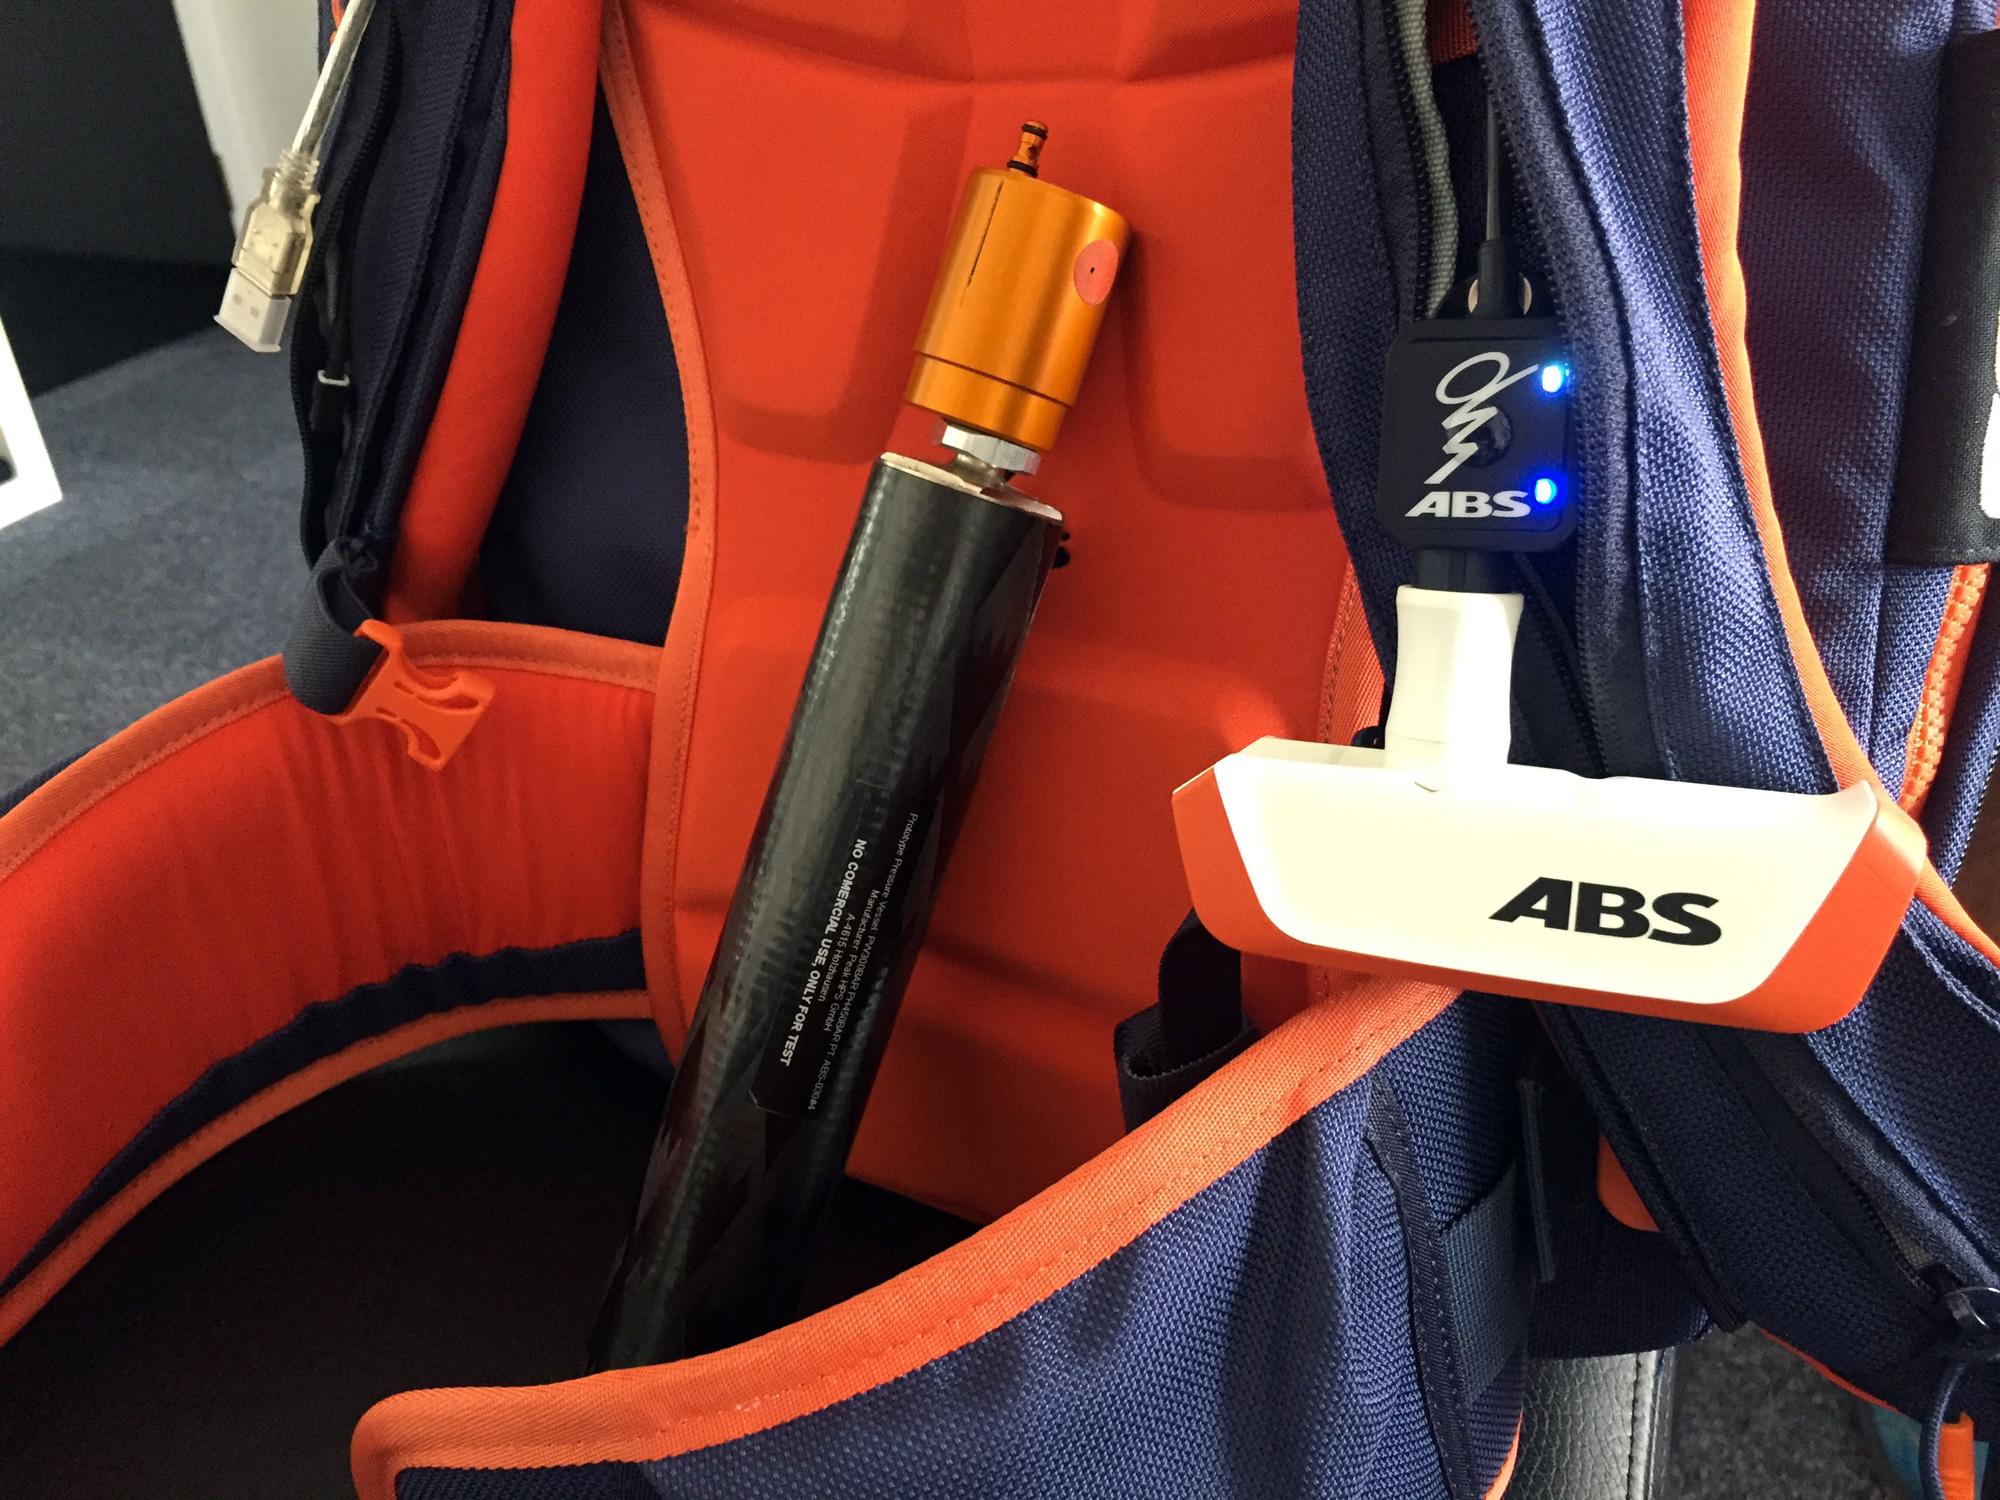 fd9e13e2f0 Ski : Dr Matos : les sacs airbags